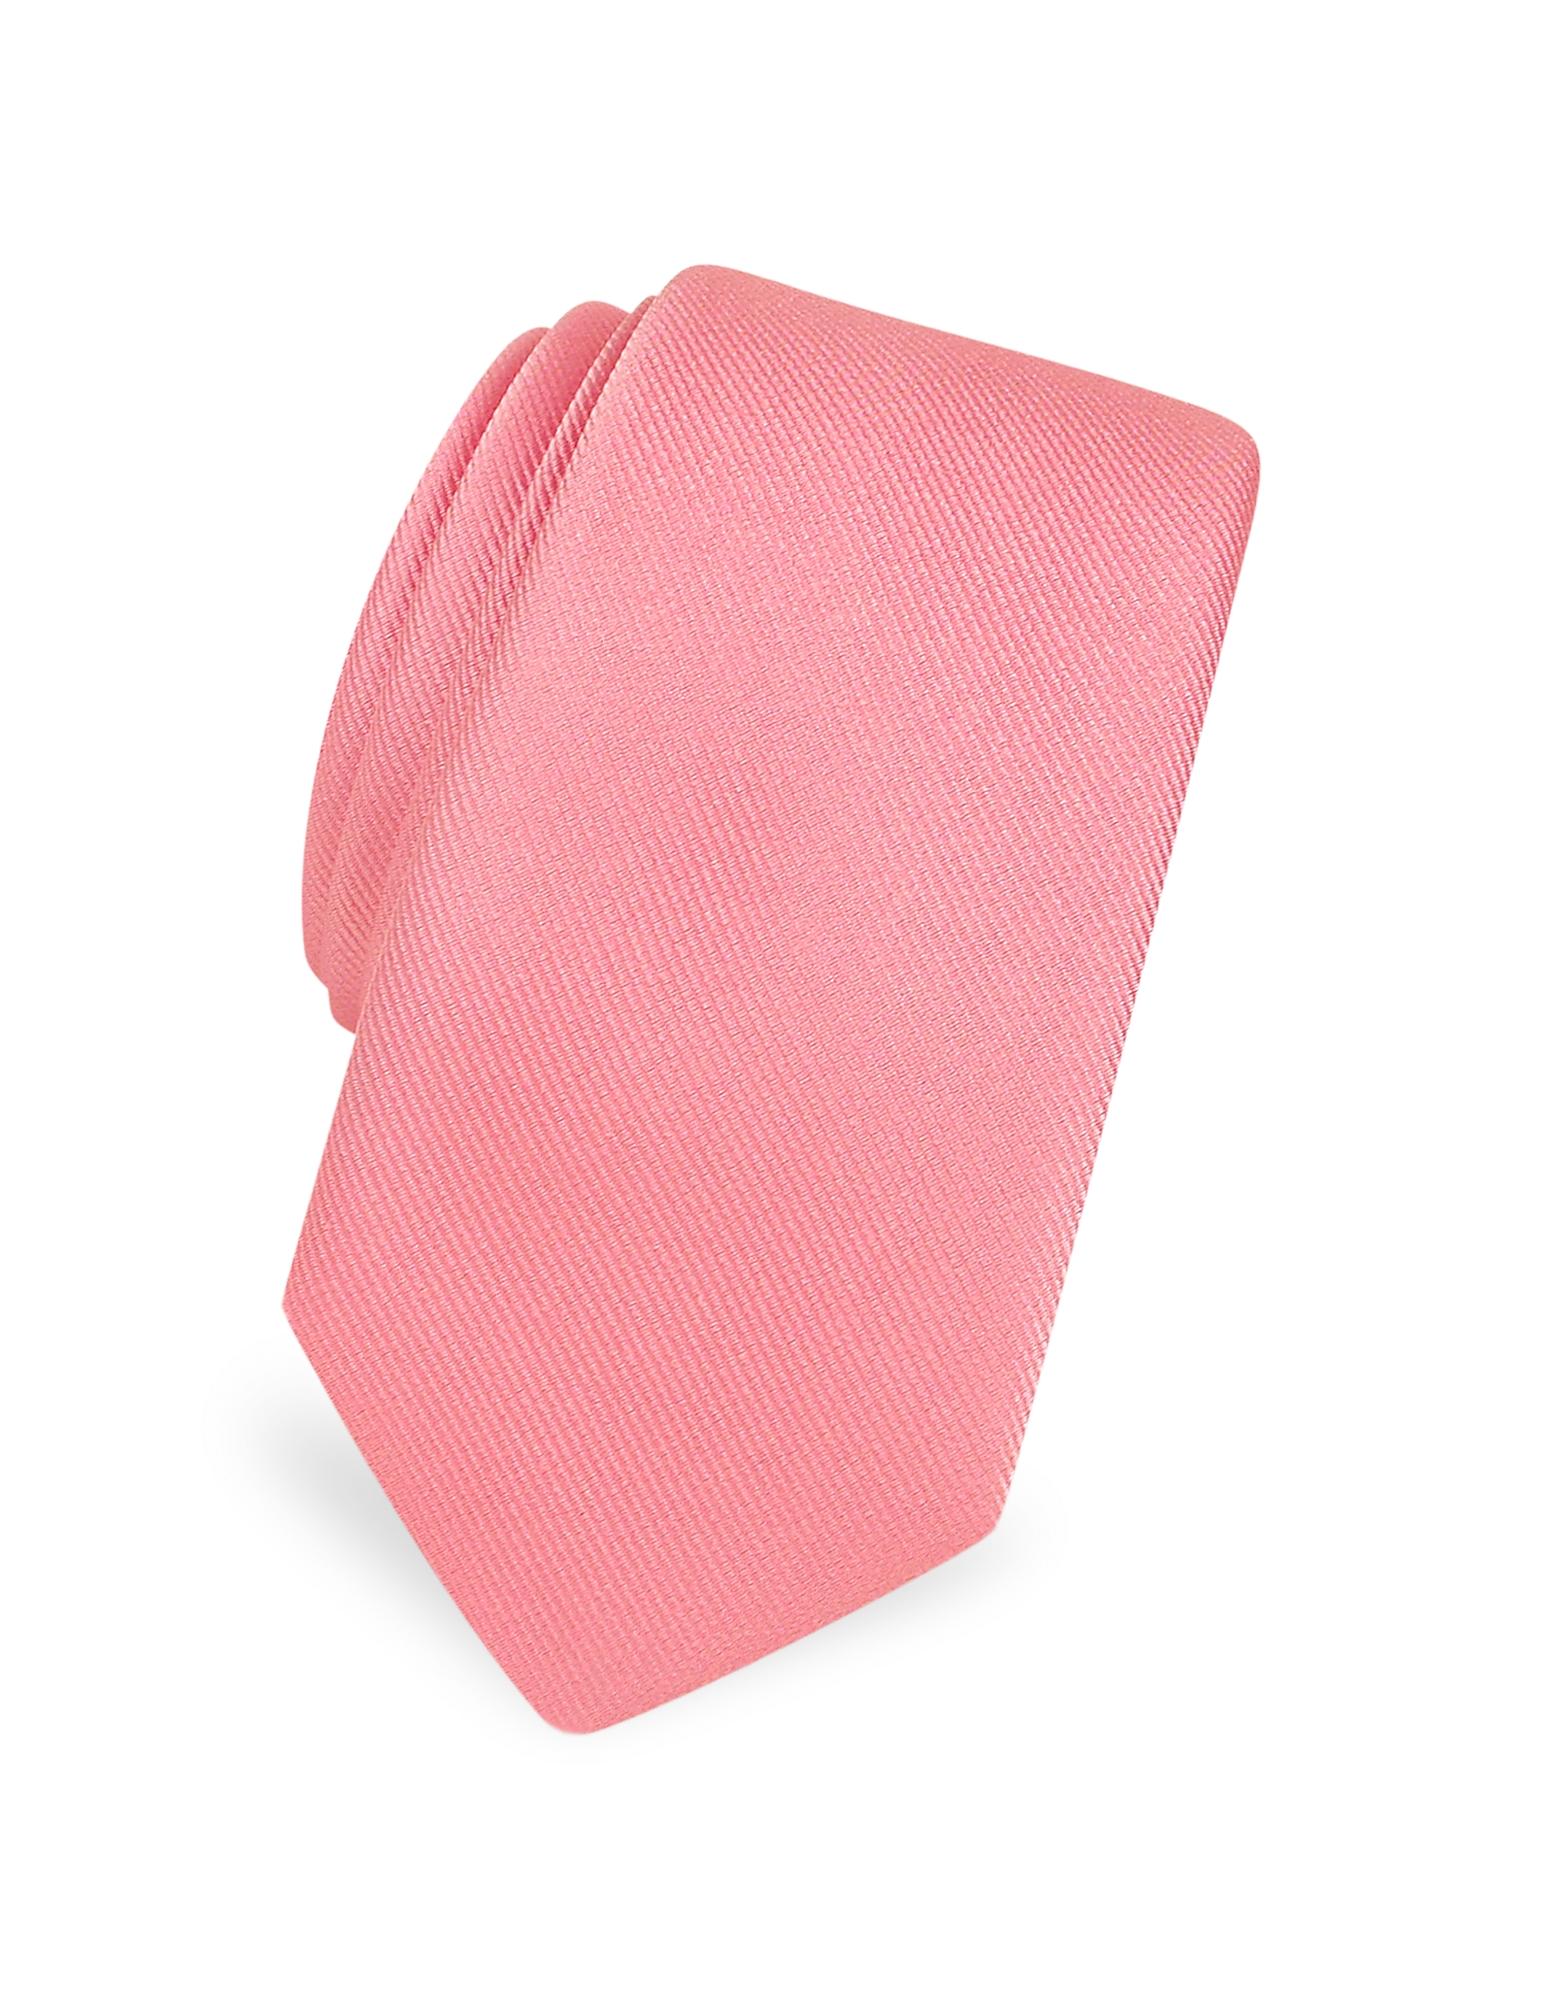 Forzieri Designer Narrow Ties, Solid Twill Silk Narrow Tie